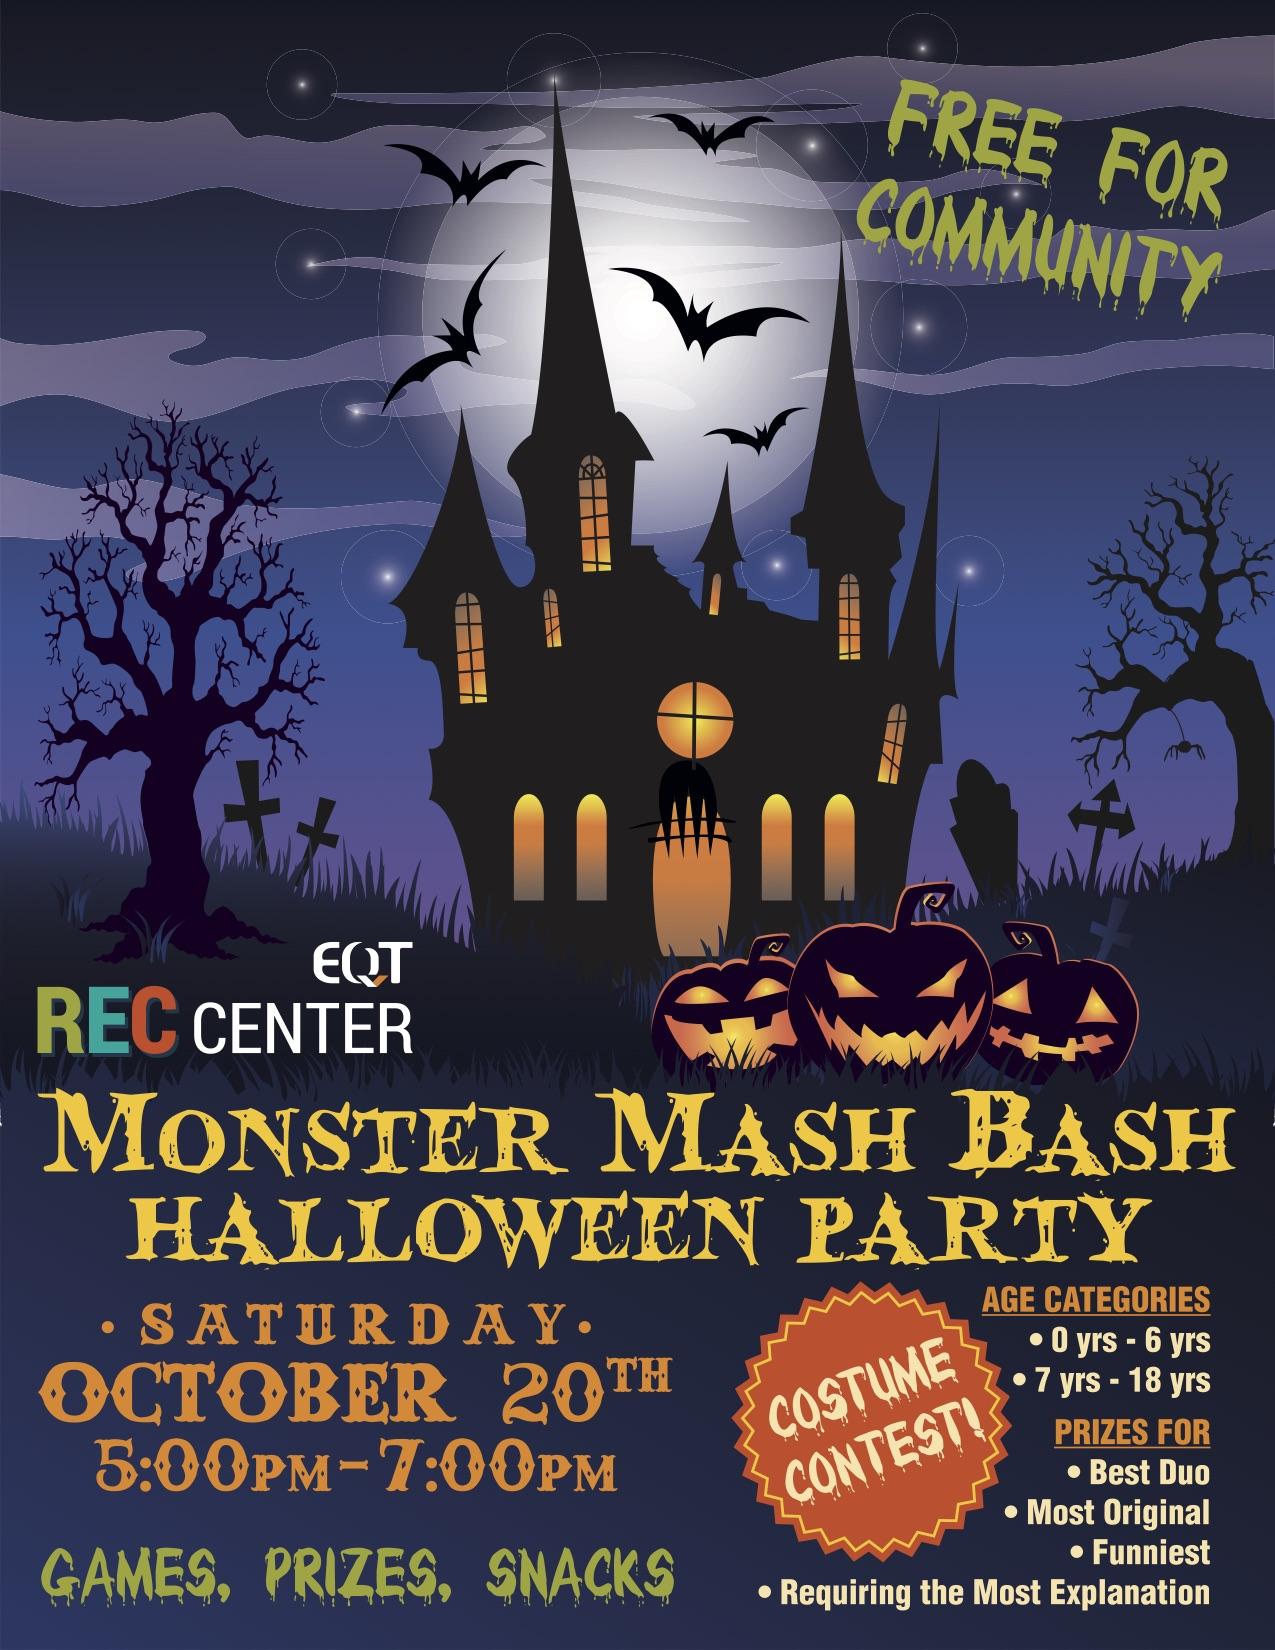 monster mash bash halloween party - eqt rec center